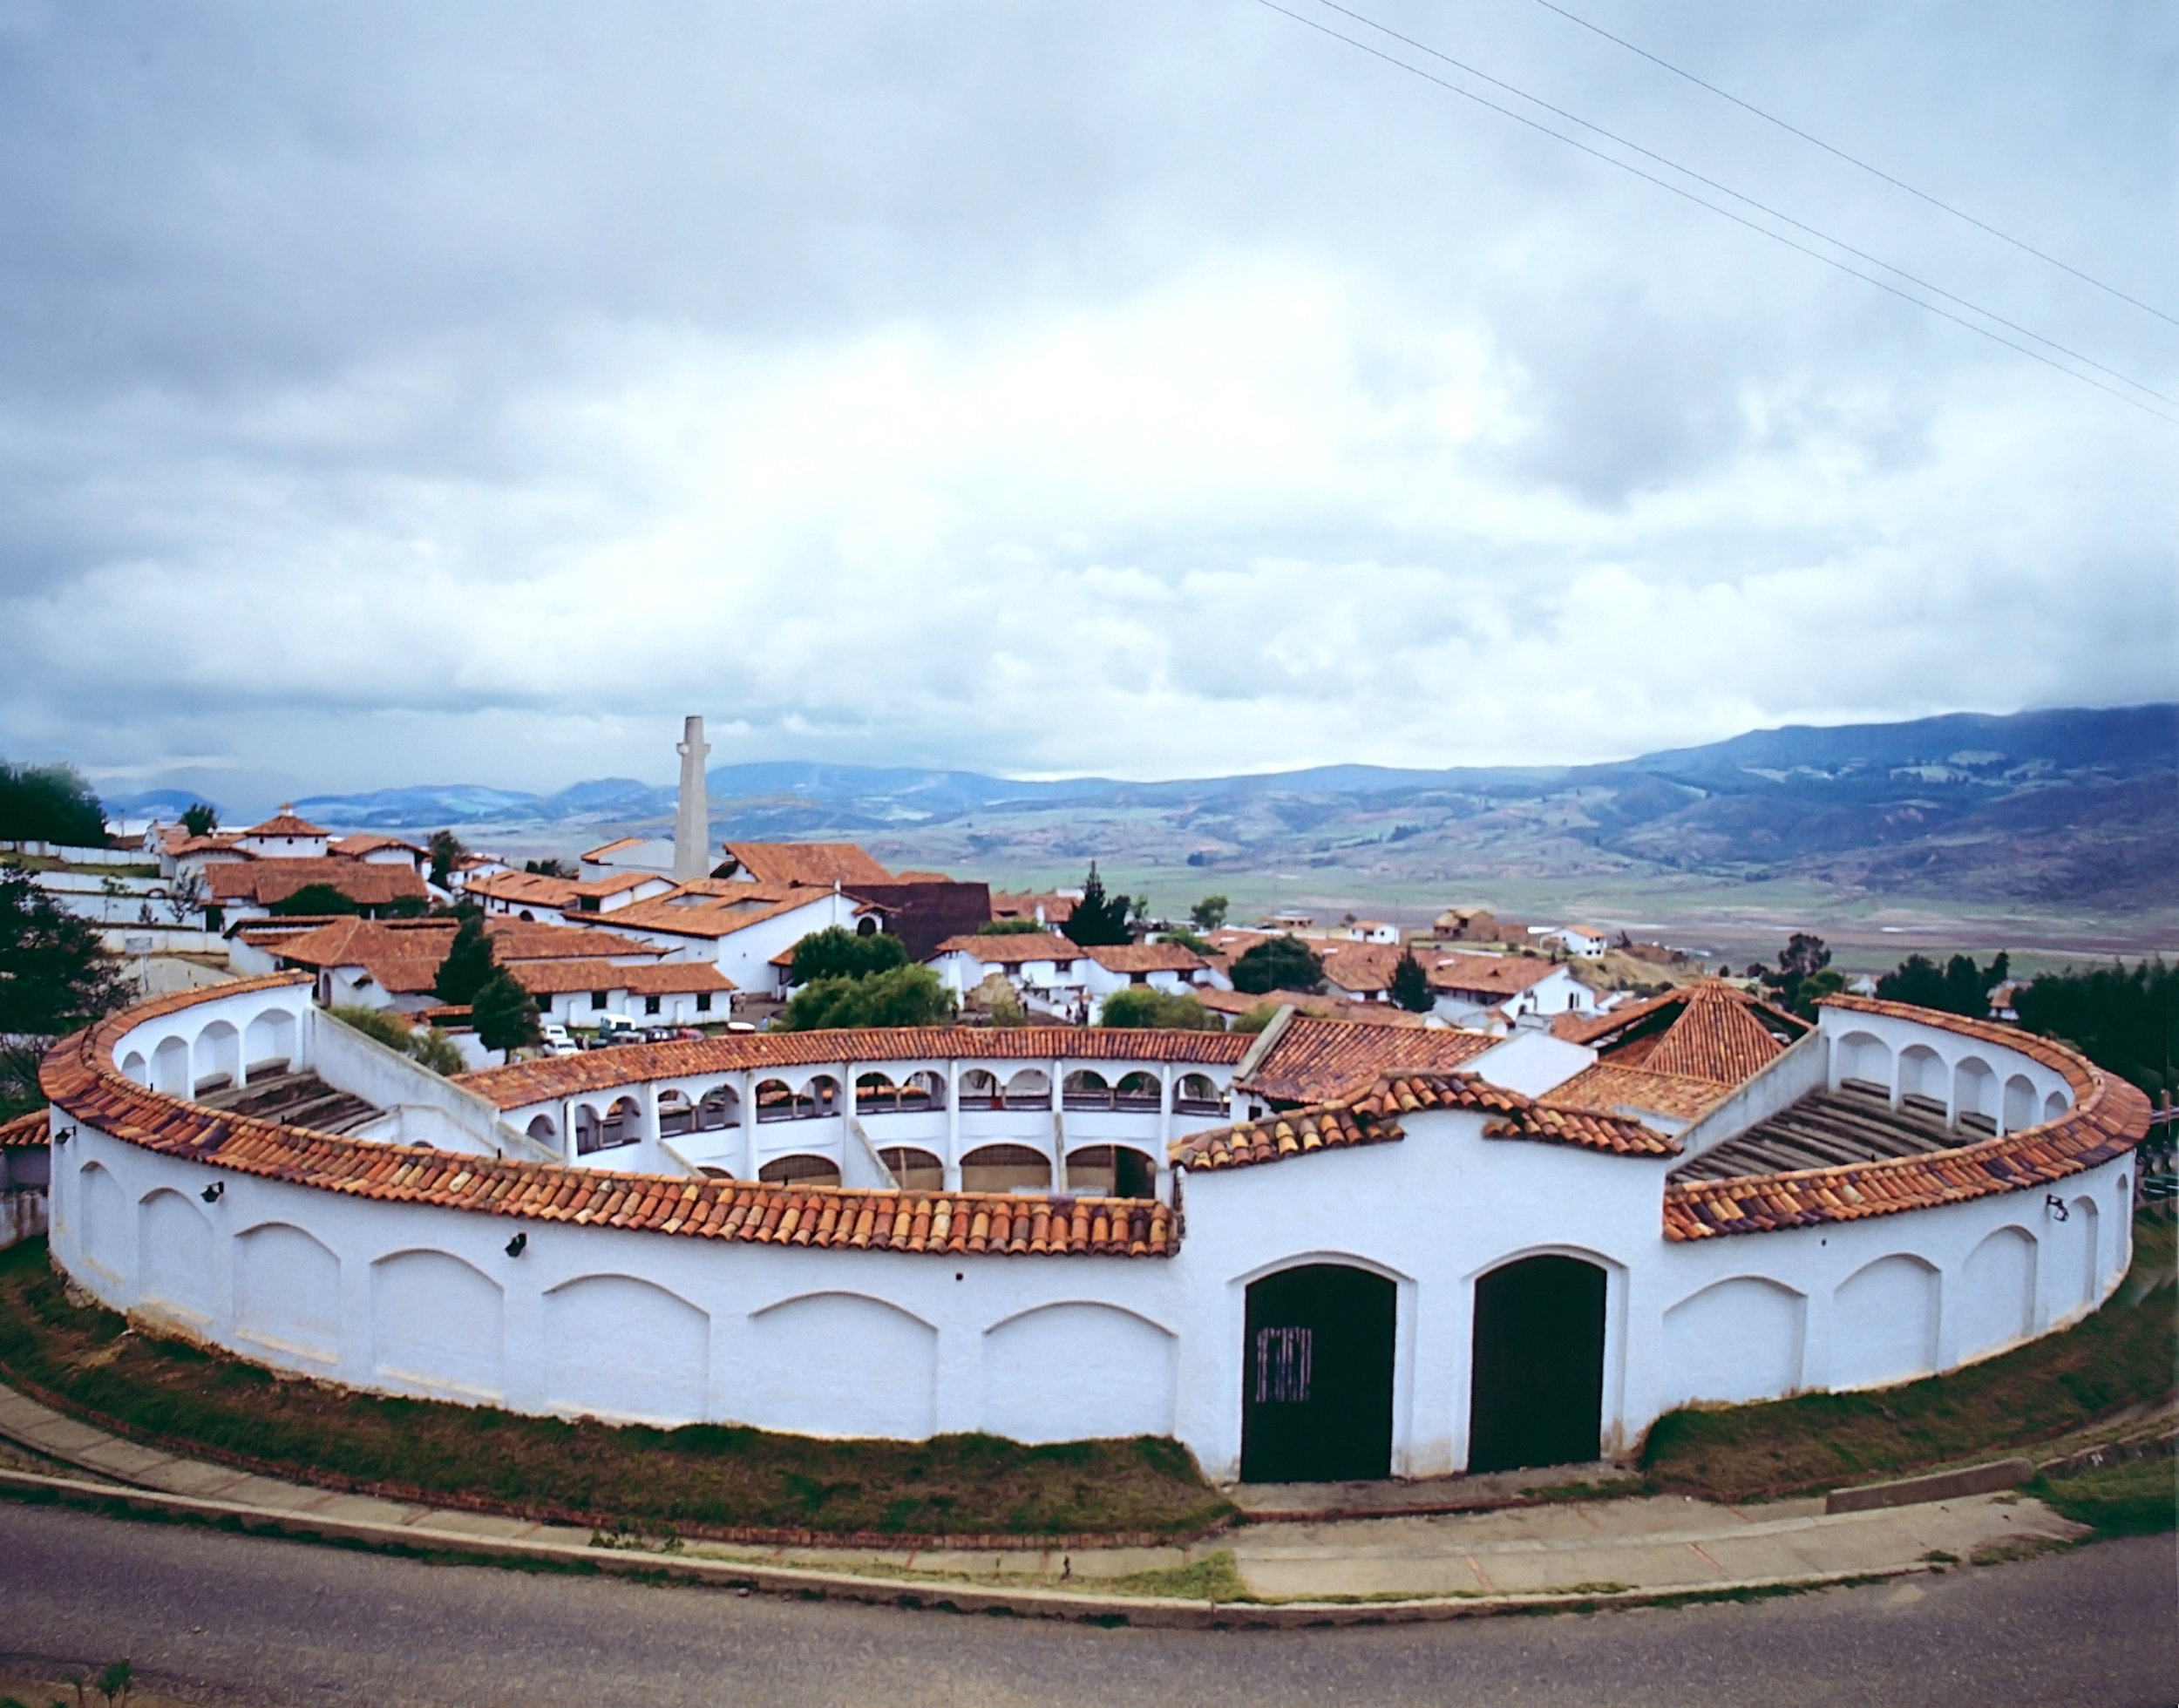 colombia_bigstock-Bullfight-arena-844329.jpg